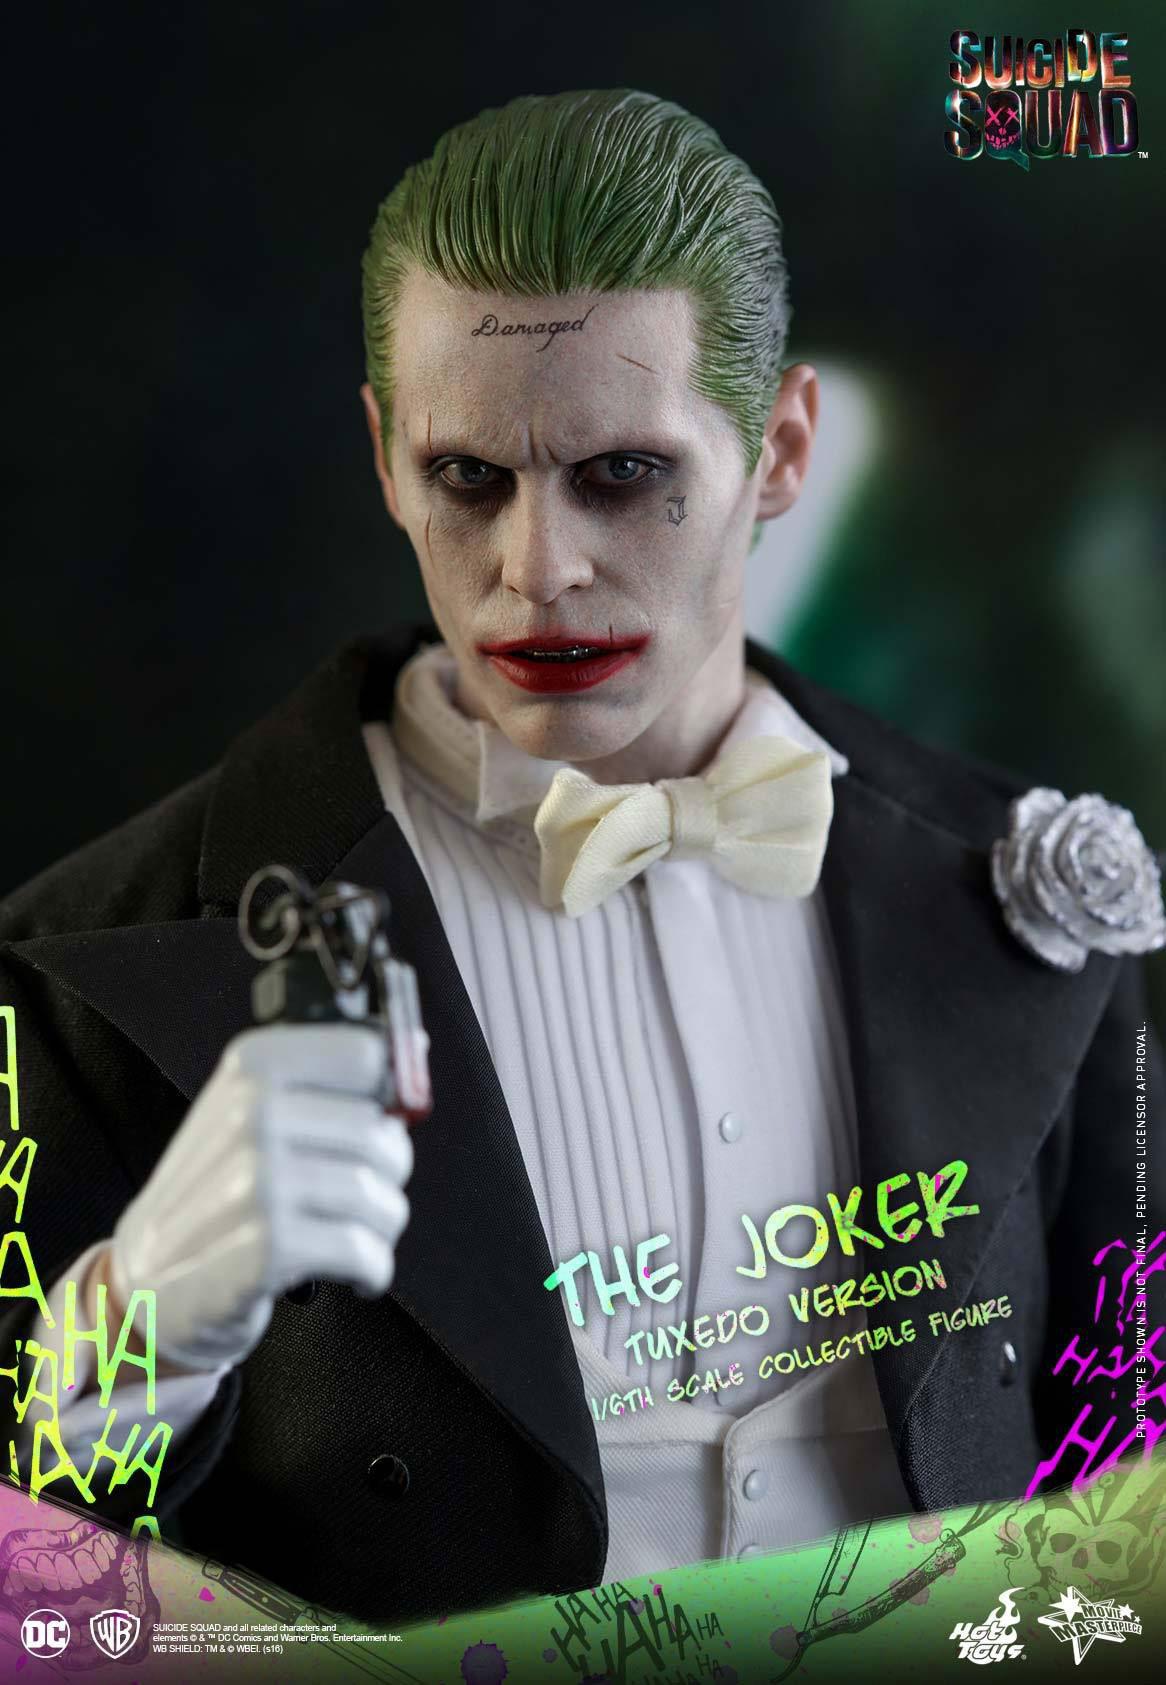 suicide-squad-hot-toys-joker-tuxedo-figure-2